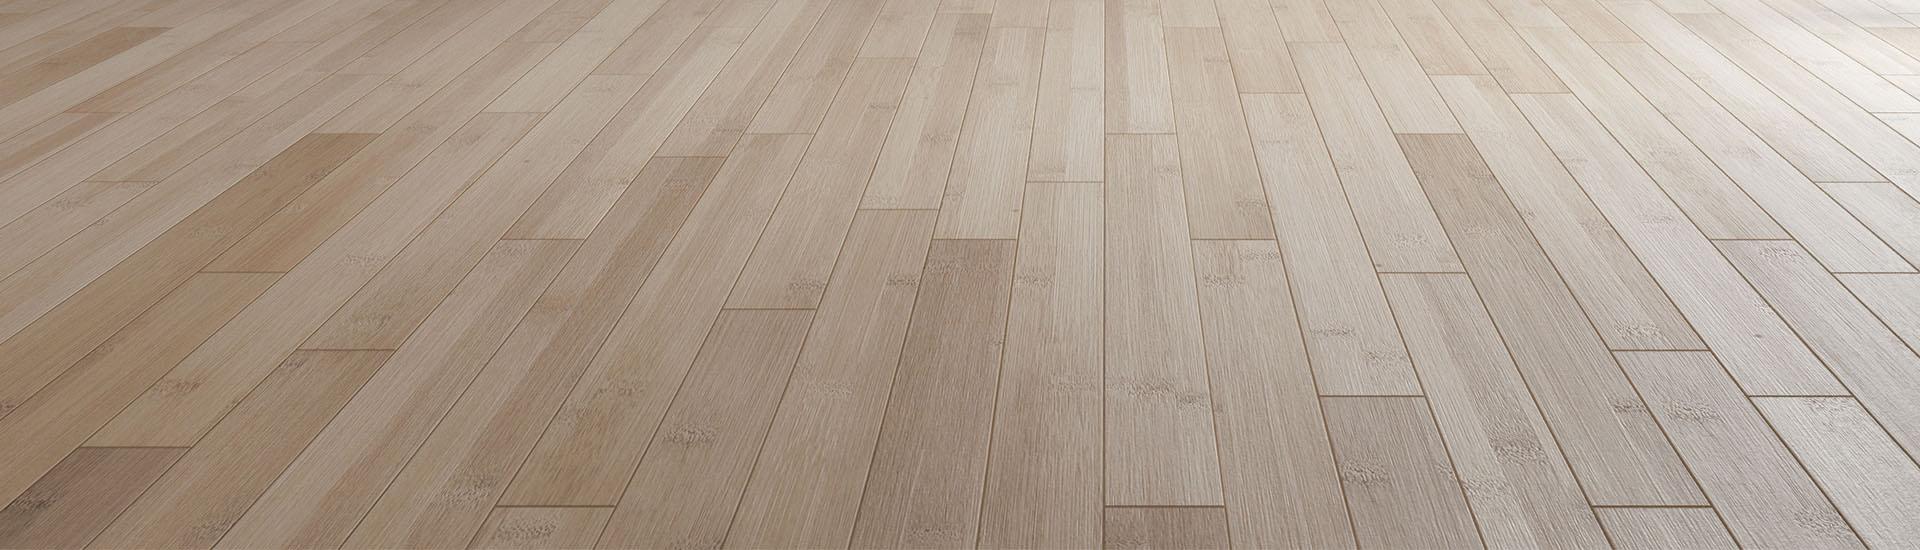 real-wood-flooring